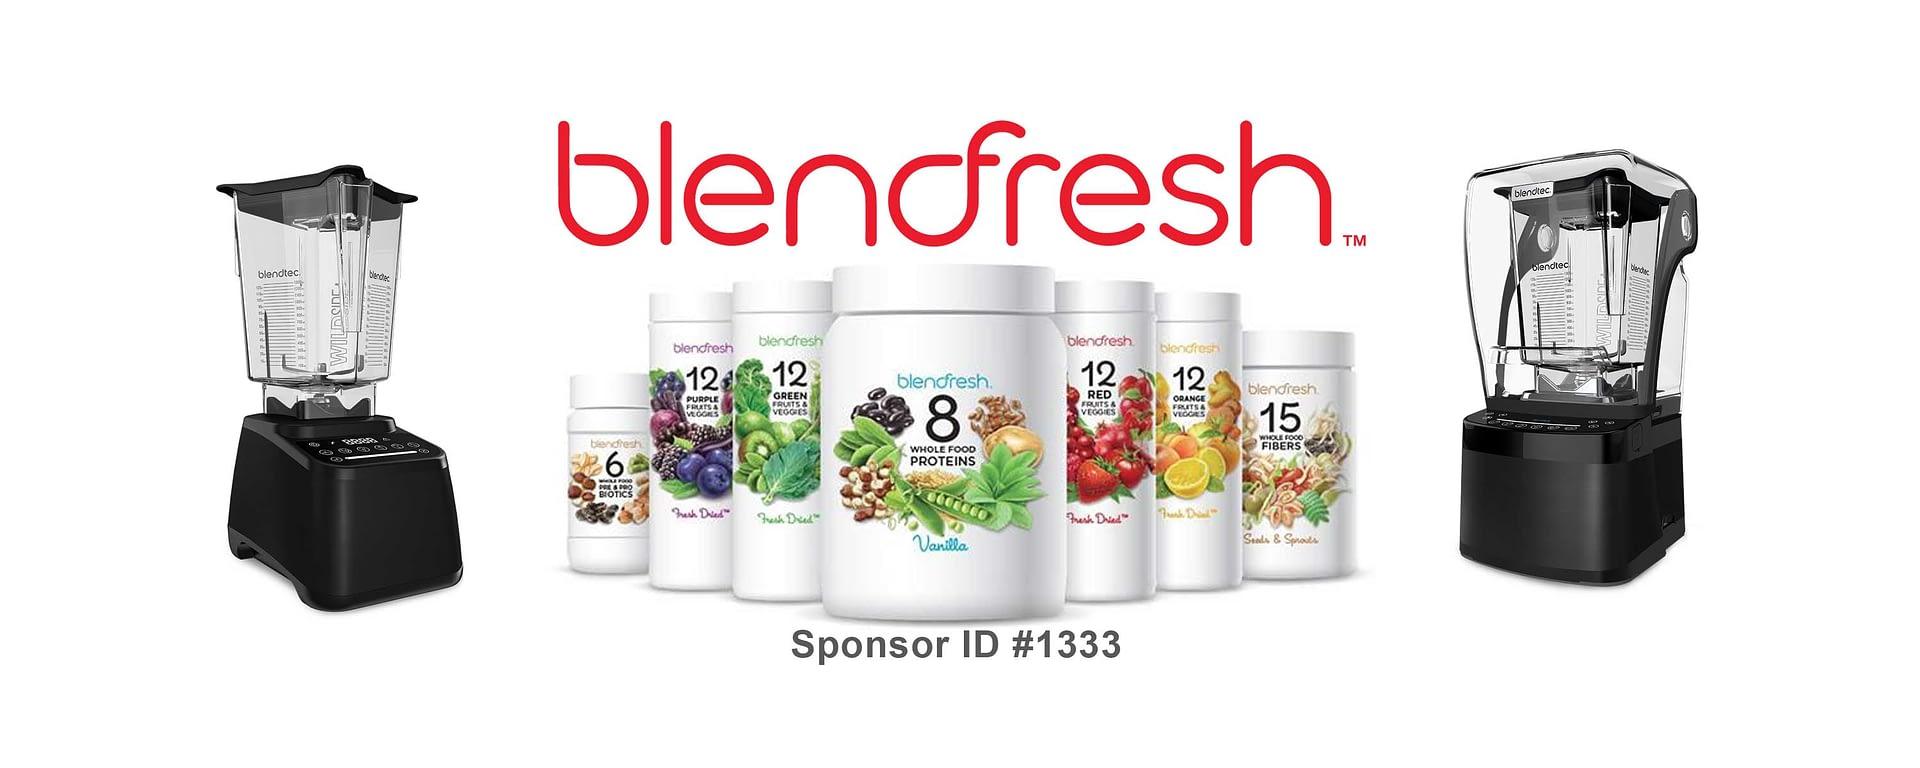 blendfresh